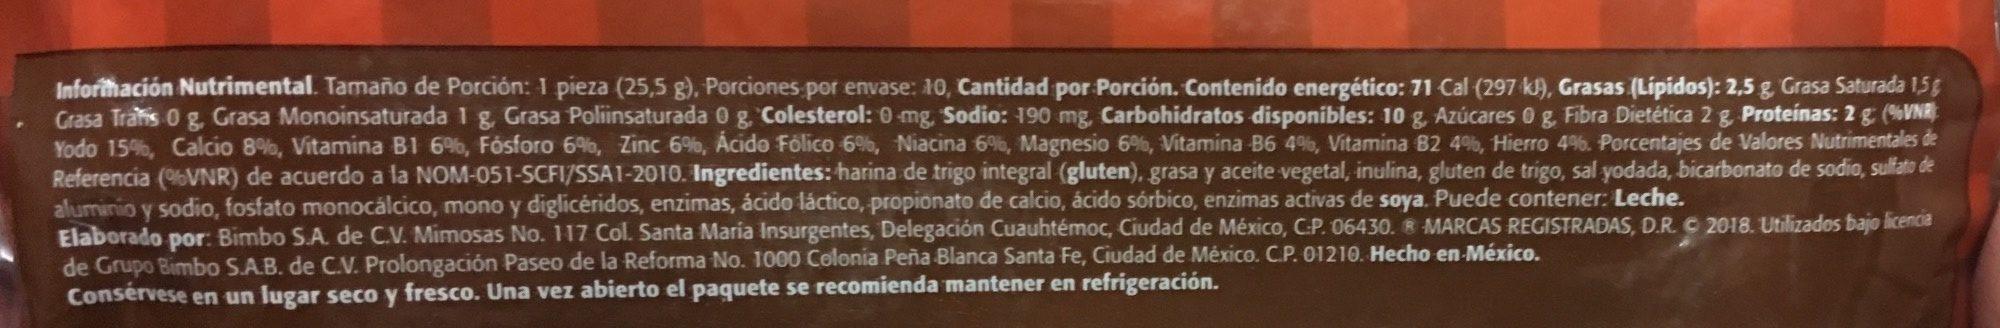 Tortillinas Integrales - Ingrédients - fr